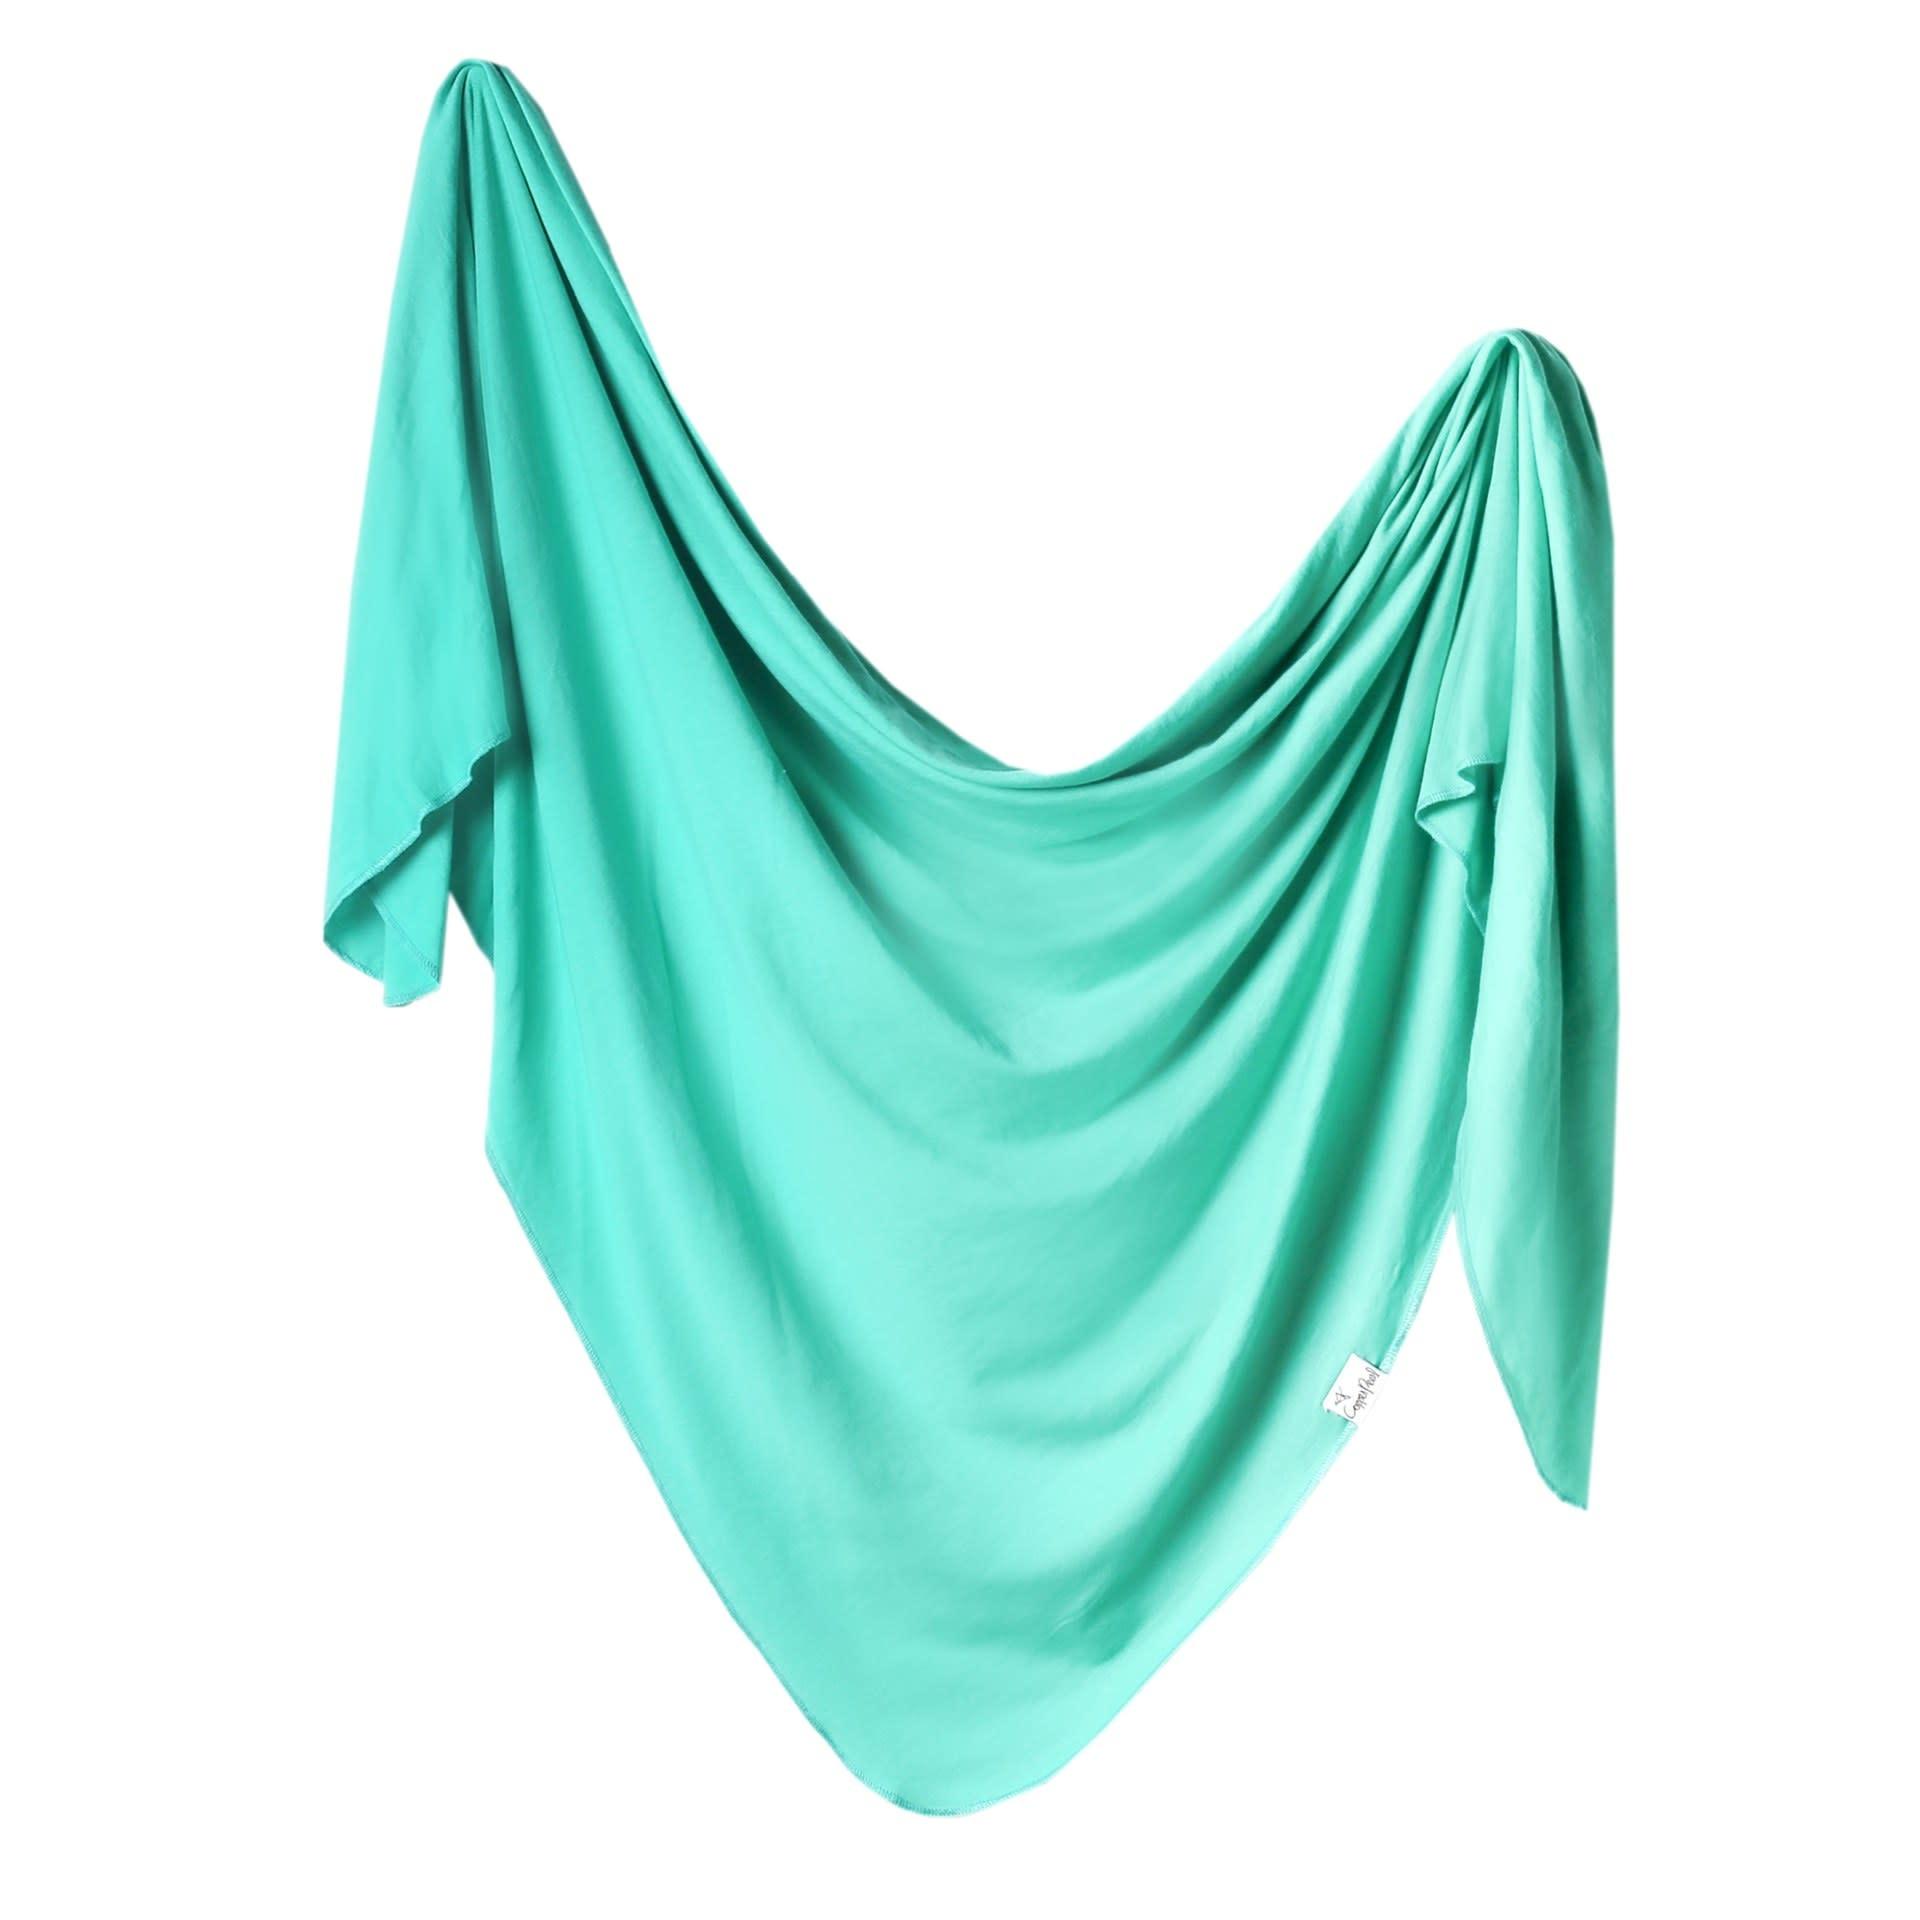 Copper Pearl Knit Blanket - Spout